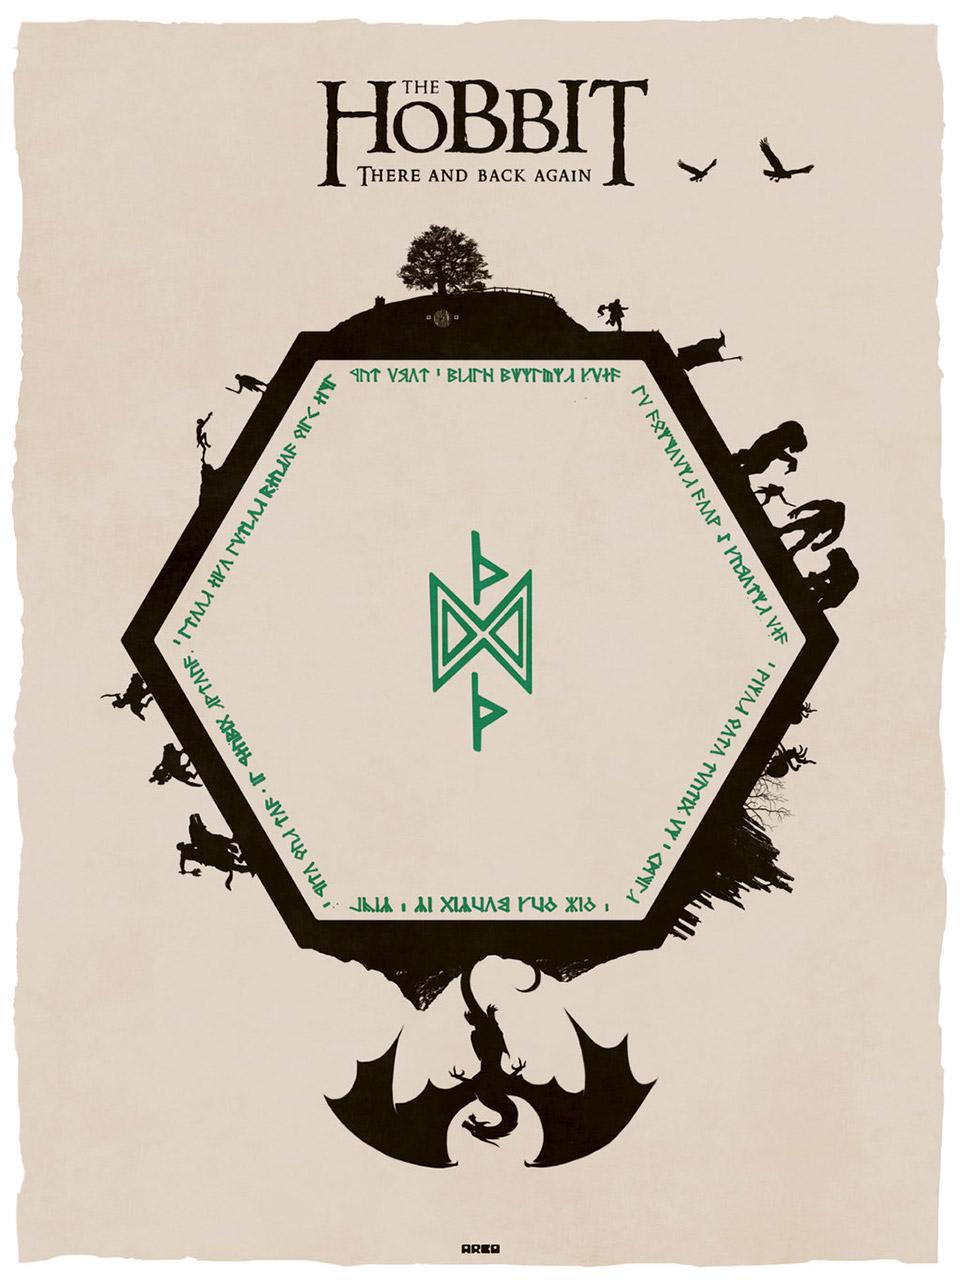 The Hobbit: Wonderful Fan Art Poster